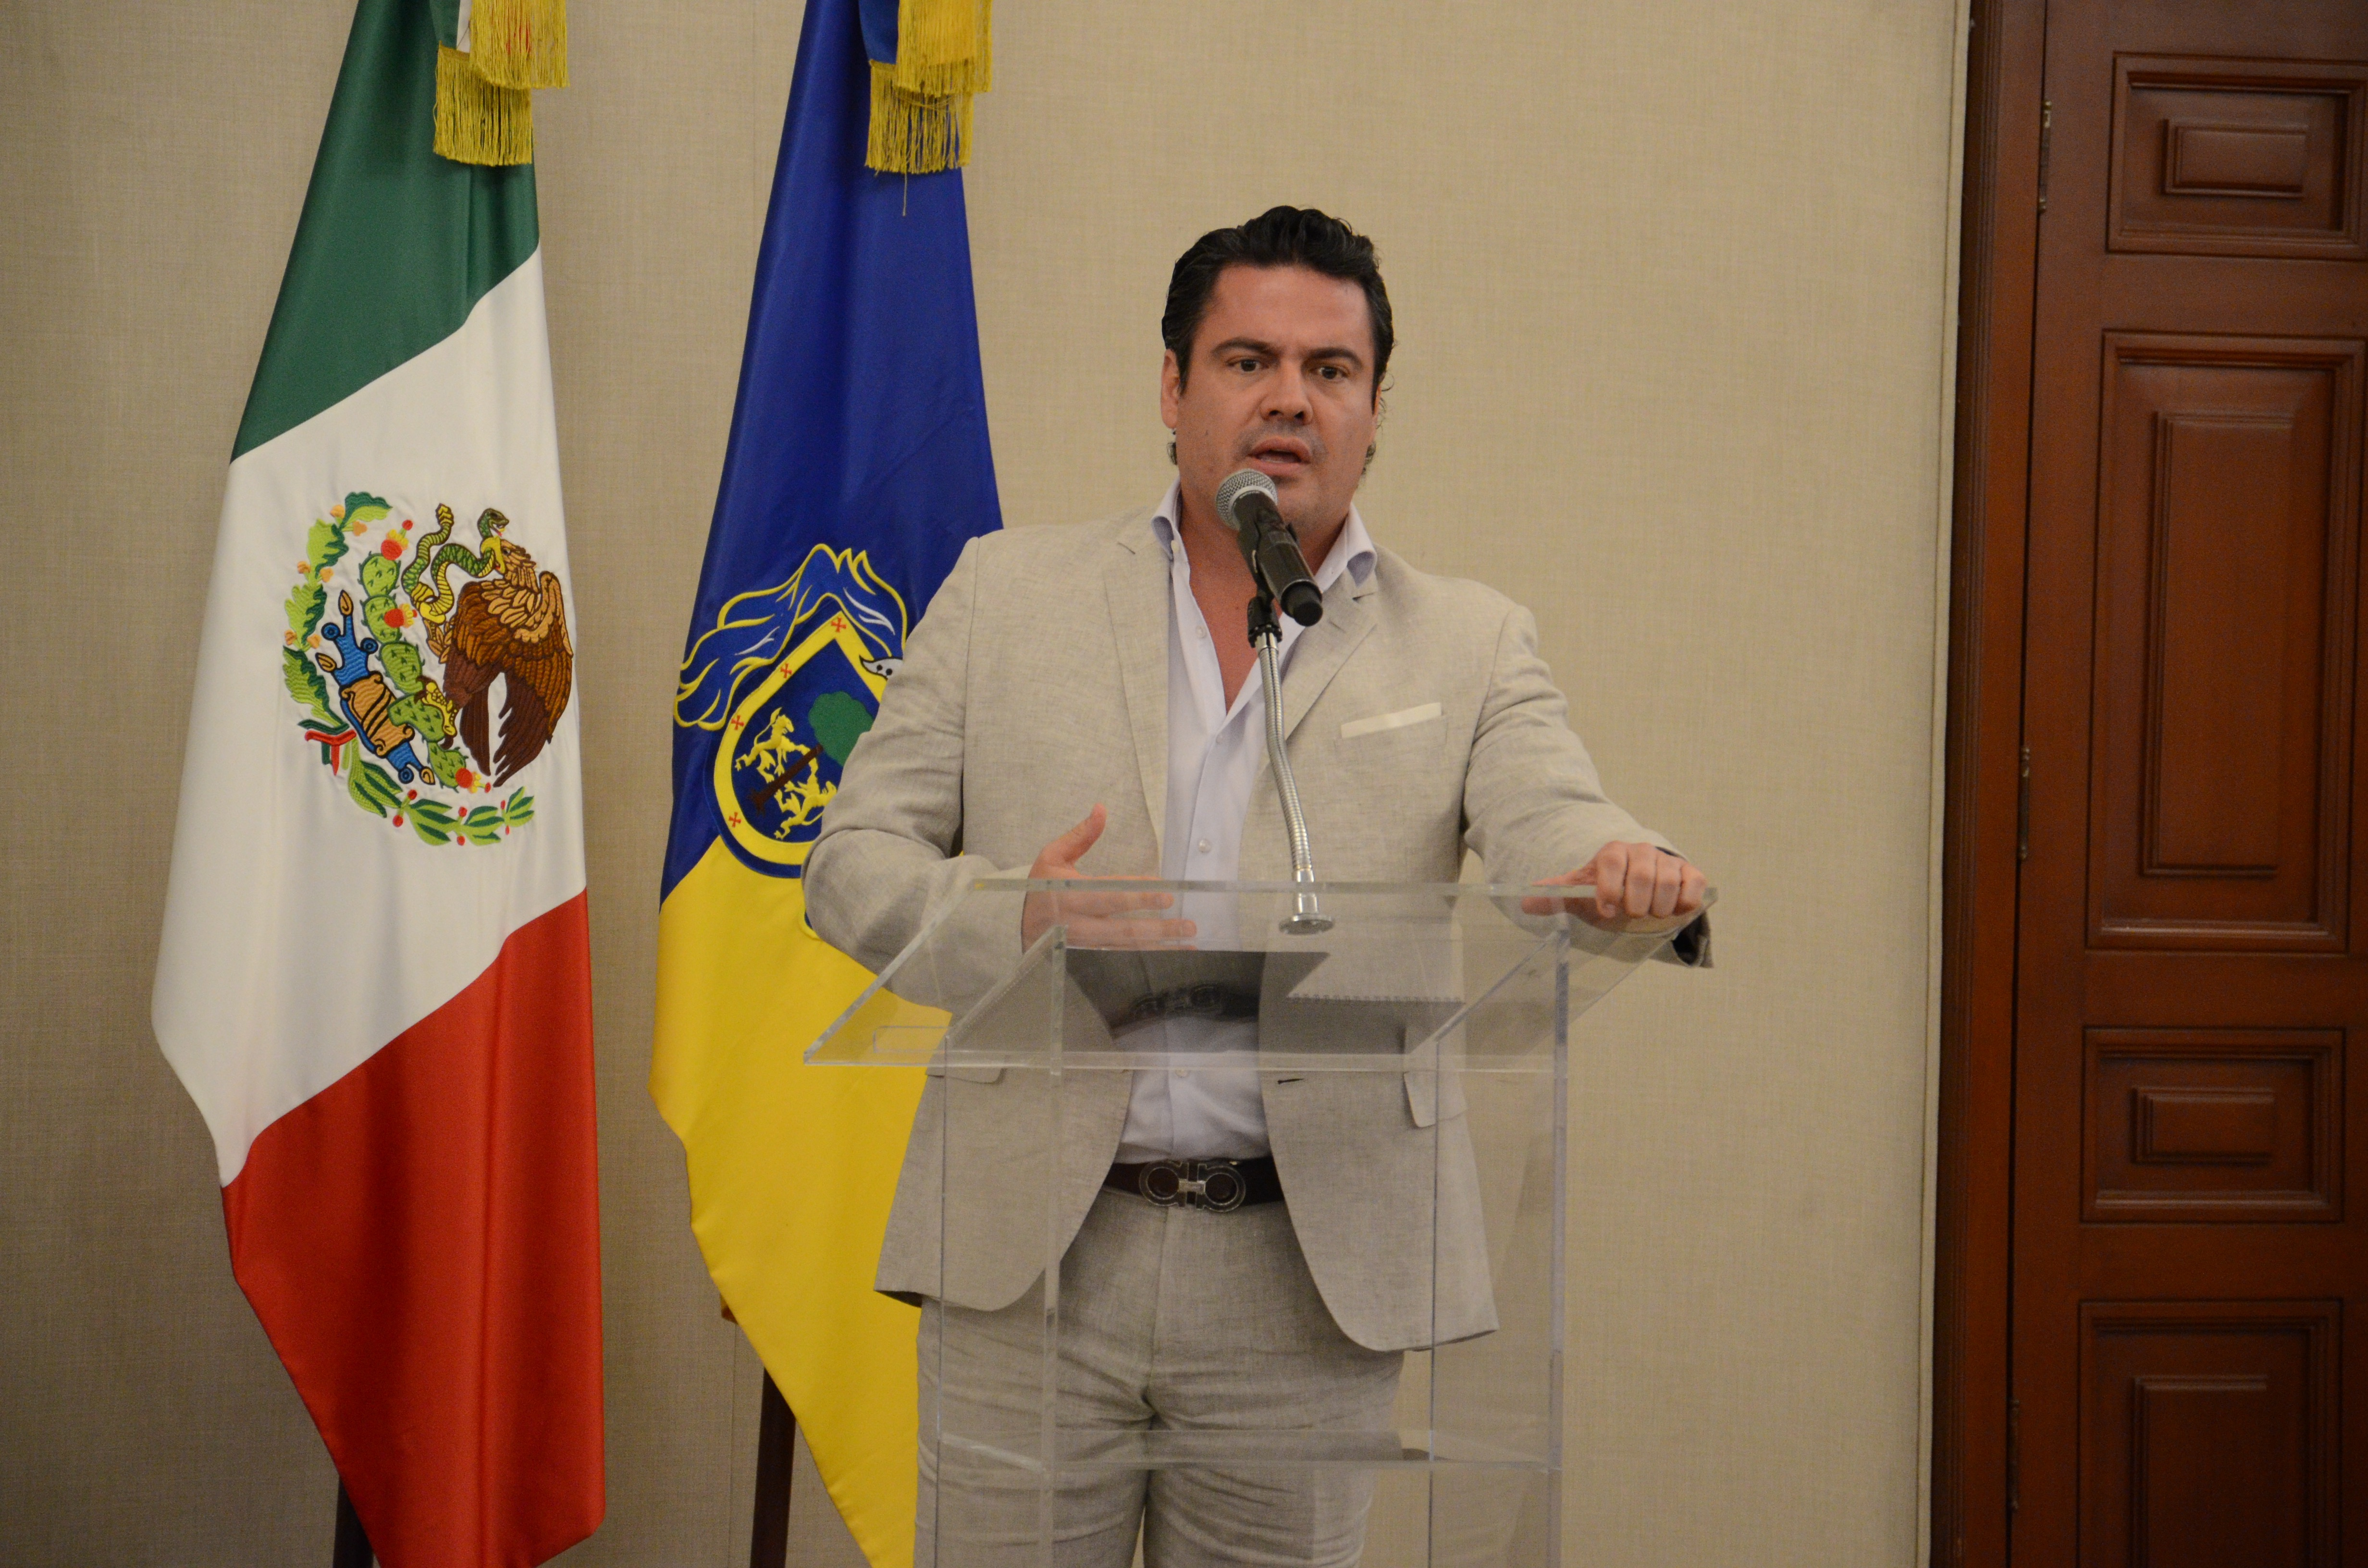 Gobernador de Jalisco ofreciendo discurso a medallistas